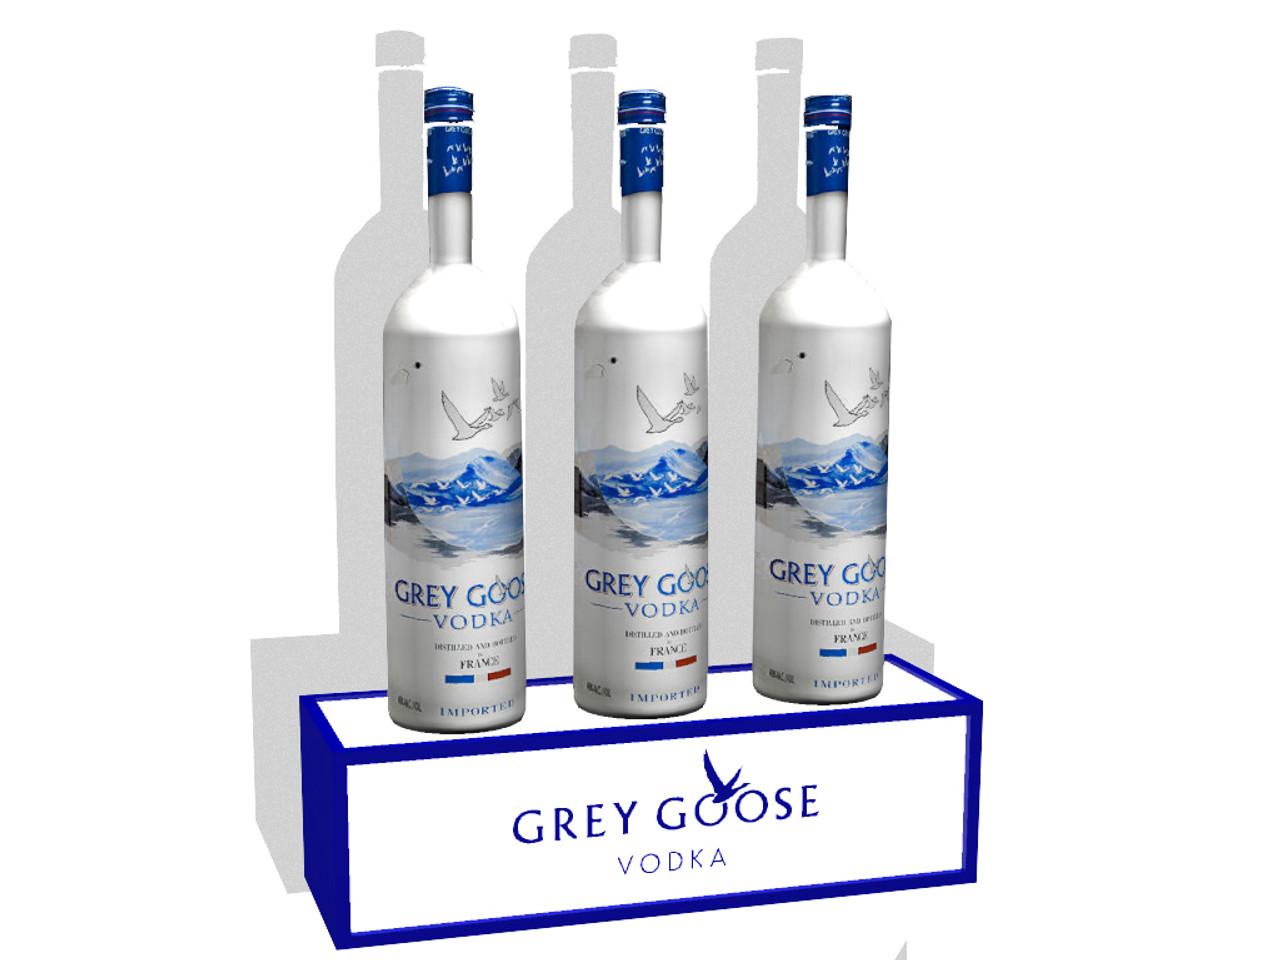 Grey Goose, Belvedere, Ketel One, Rum,Vodka, Tequila, Stand, Point of sale, POS, Shelf, Display, single, three, triple, bottle, Bottle display, custom, logo, customizable, personalize